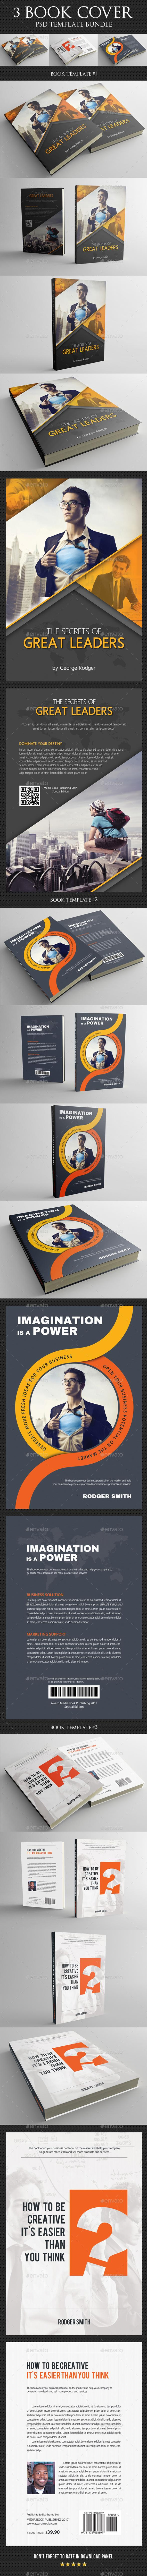 3 Corporate Book Cover Template Bundle V3 - Miscellaneous Print Templates